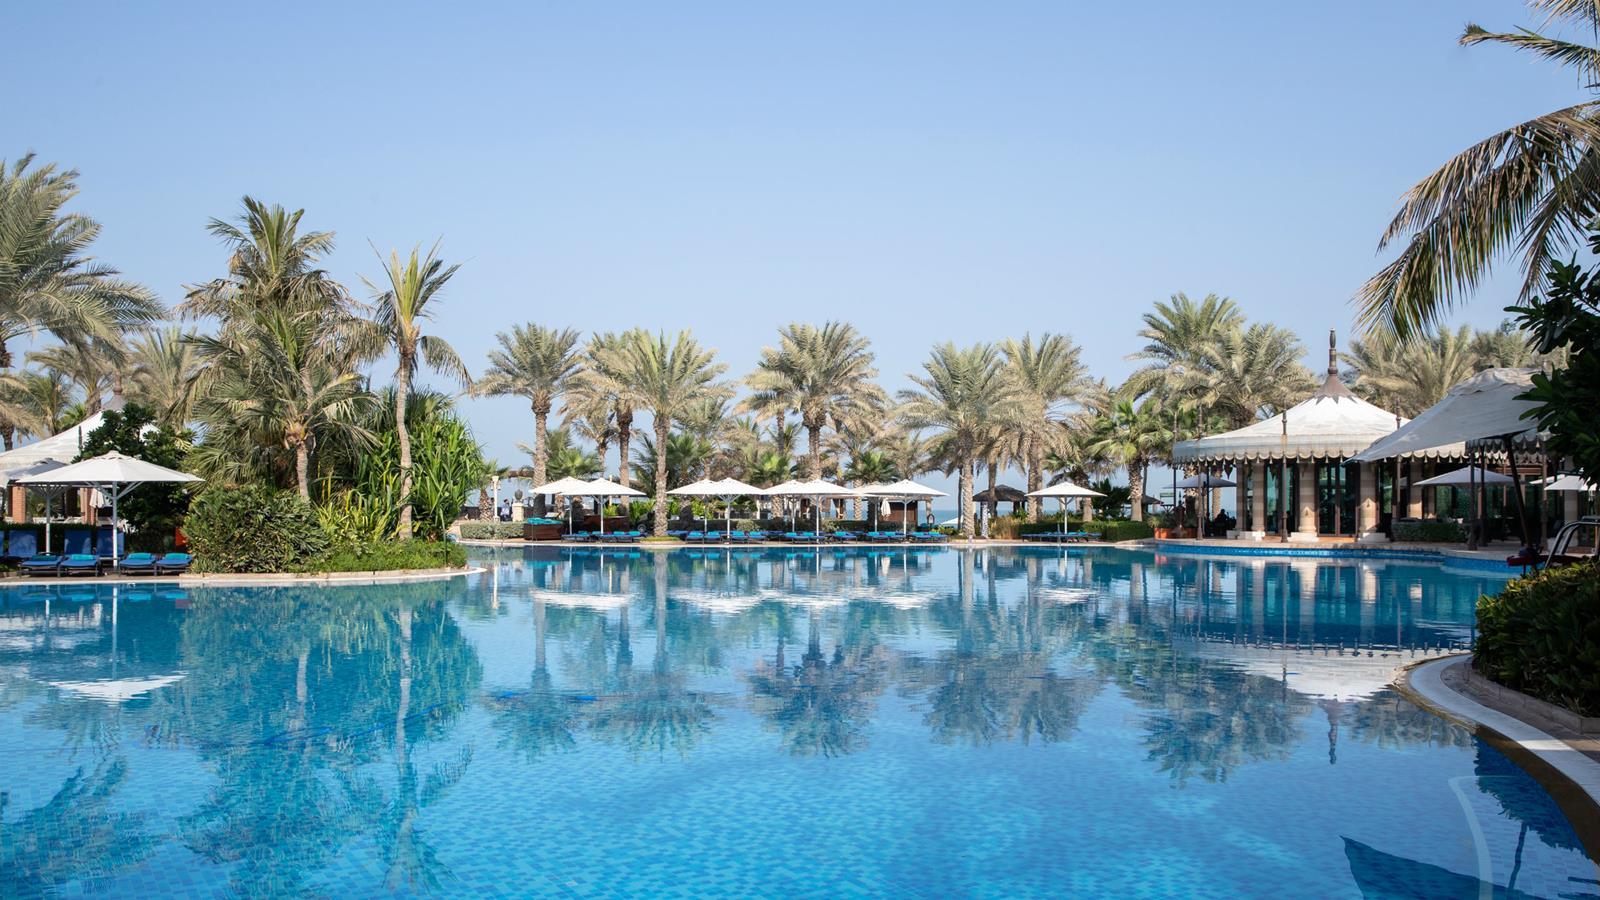 jumeirah-al-qasr-main-pool-hero-gallery.jpg